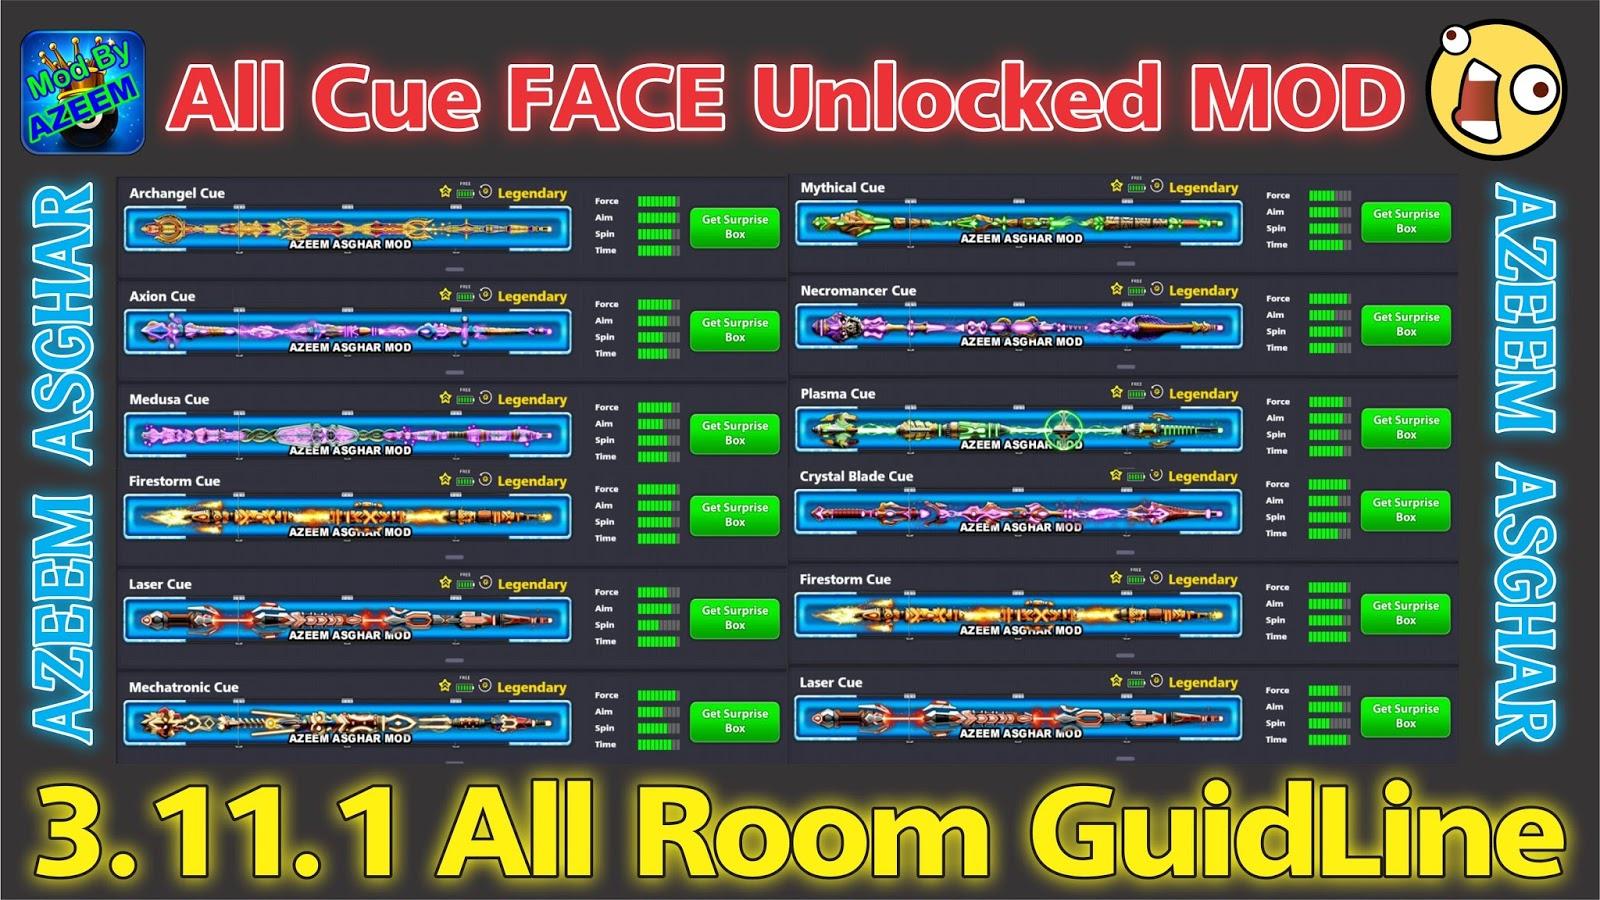 8 ball pool legendary cues mod apk download 4.0.2